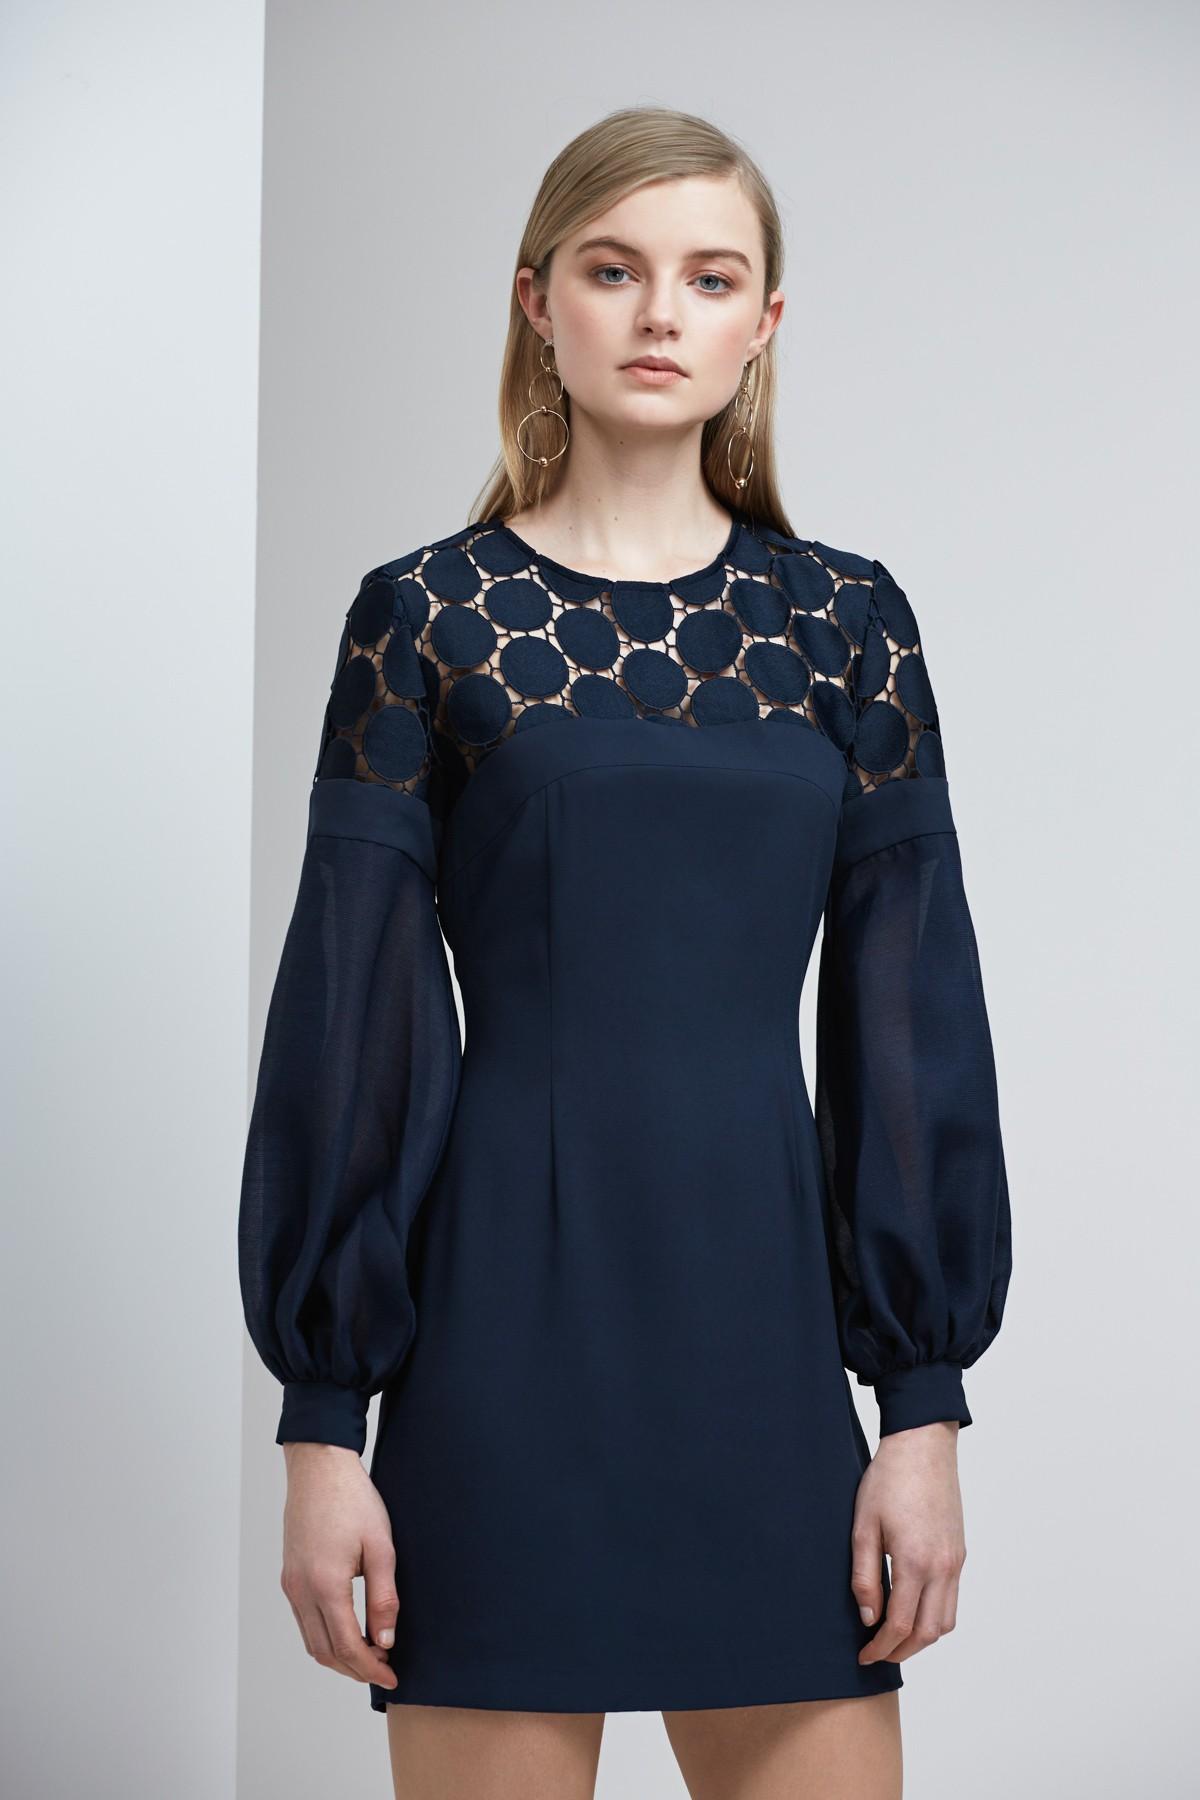 Shop Keepsake Spectrum L/S Lace Mini Dress.